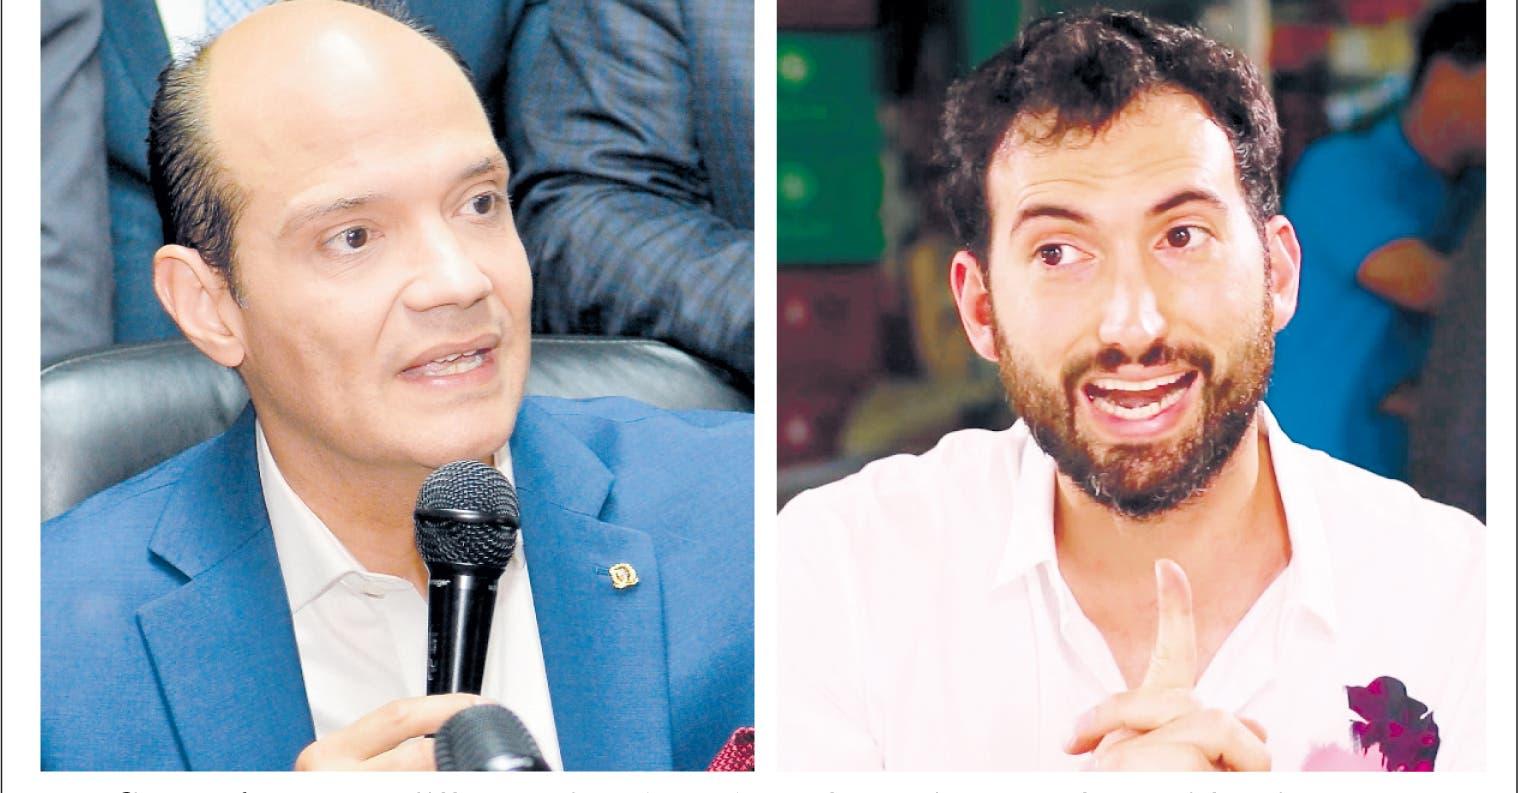 Ramfis Domínguez Trujillo  y  Karim Abu Naba' a, dos  aspirantes  a la Presidencia.